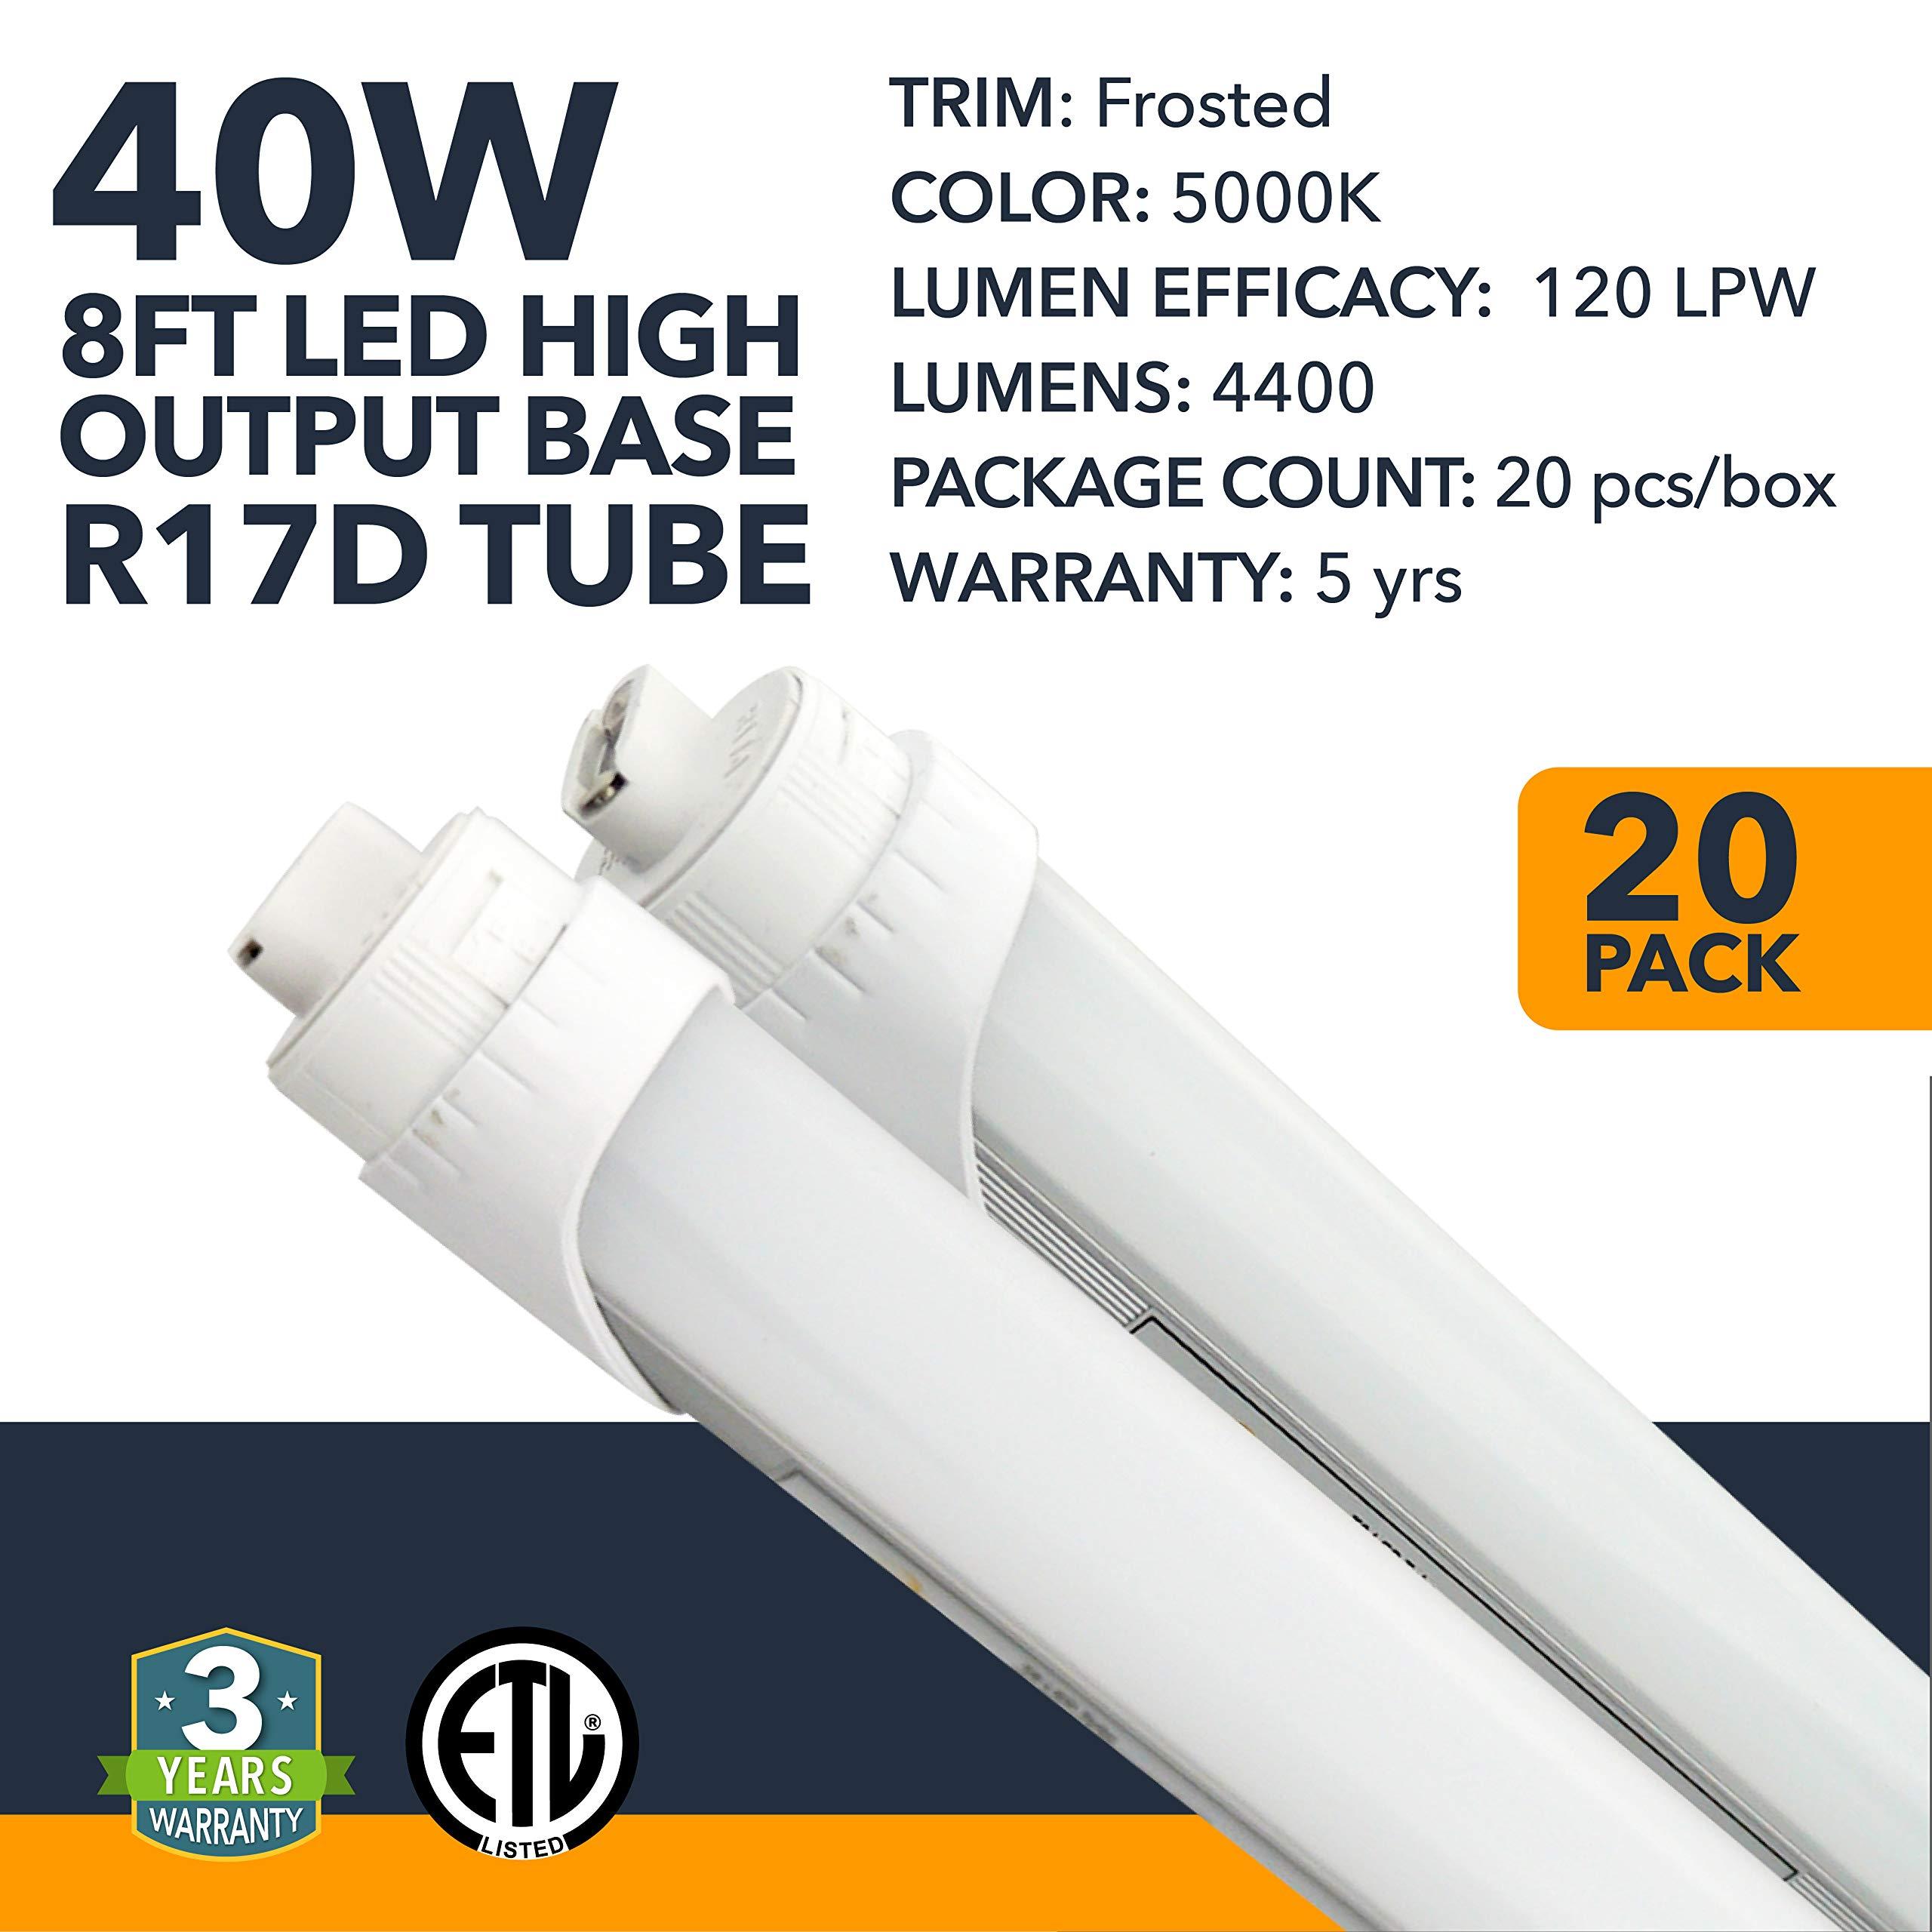 8FT LED Tube Light - R17D Base - High Output Warehouse LED Two-Ended Bypass Tube Light, 4400 Lumens - Residential or Commercial Garage Workshop Tube Light - 3 Year Warranty - Frosted - 5000K - 20PK